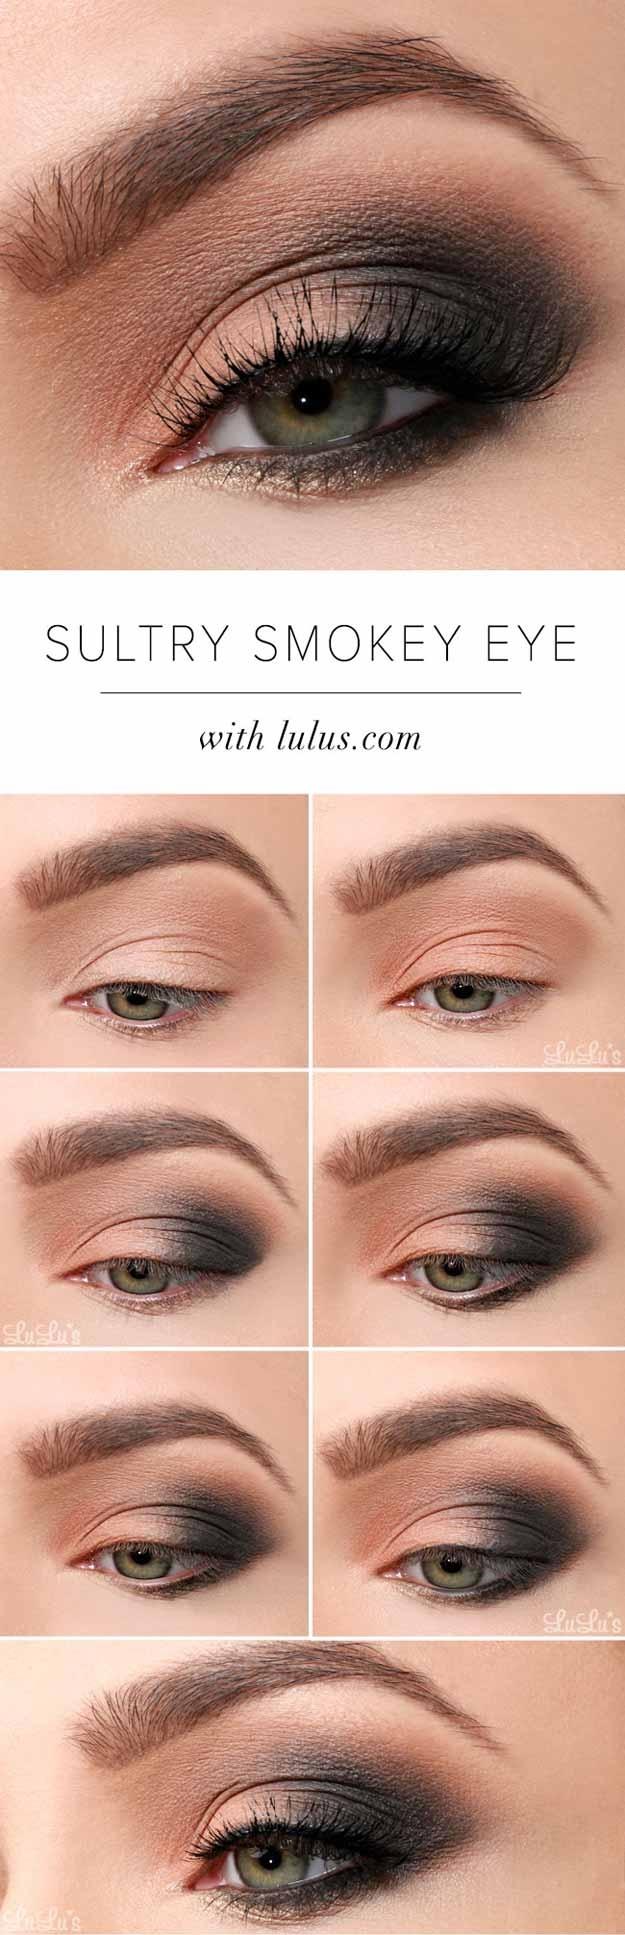 35 Wedding Makeup For Blue Eyes - The Goddess for Makeup For Blue Eyes Fair Skin Brown Hair